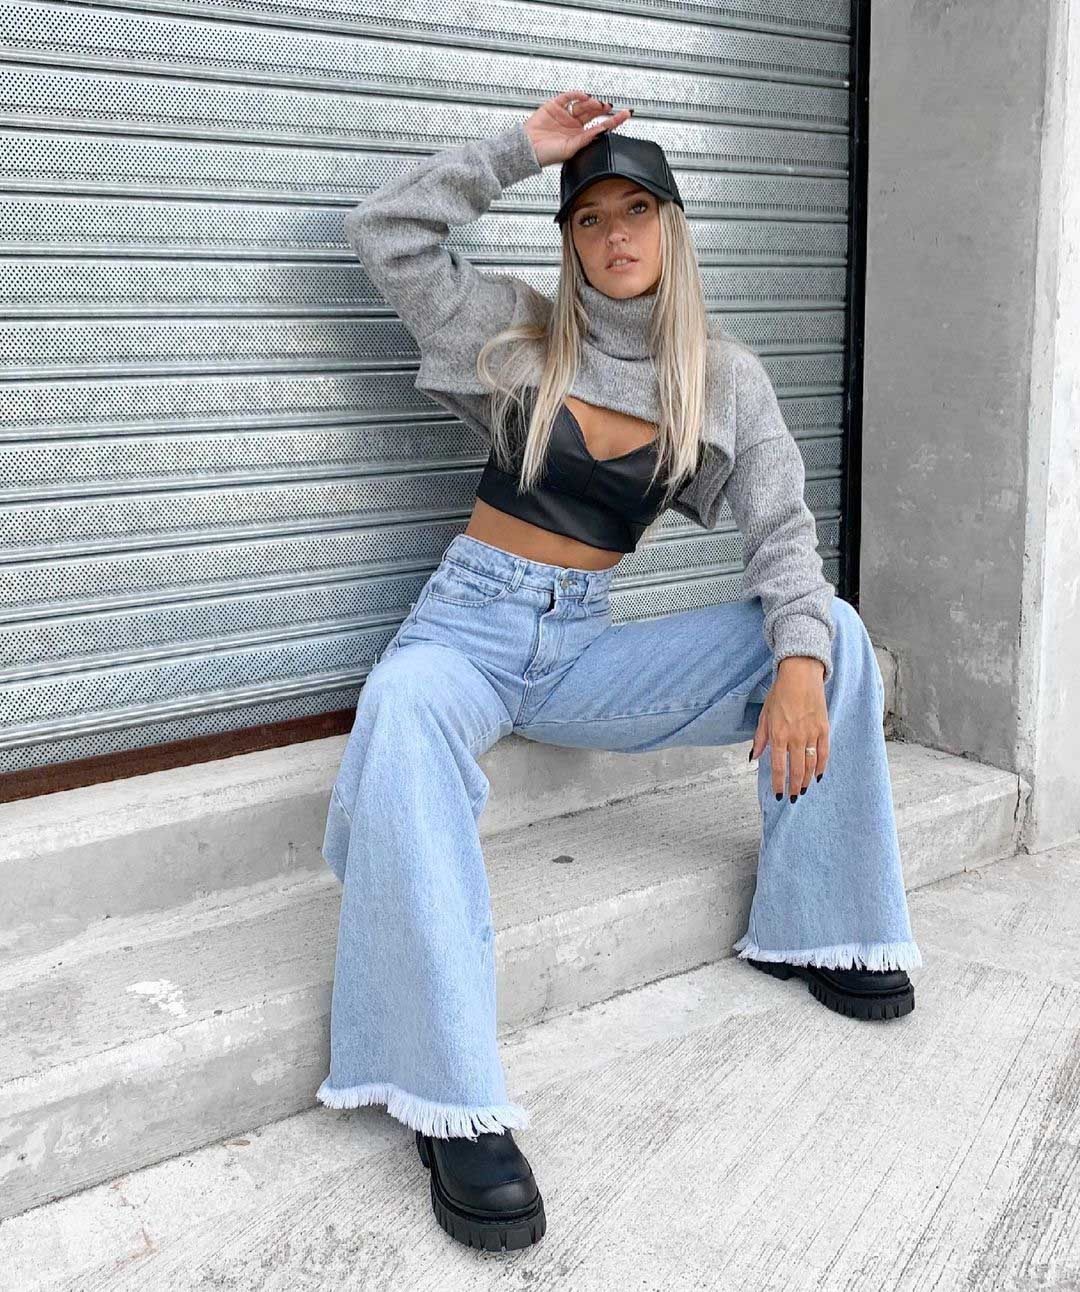 pantalones de jeans tiro alto oxford desflecado invierno 2021 moda invierno 2021